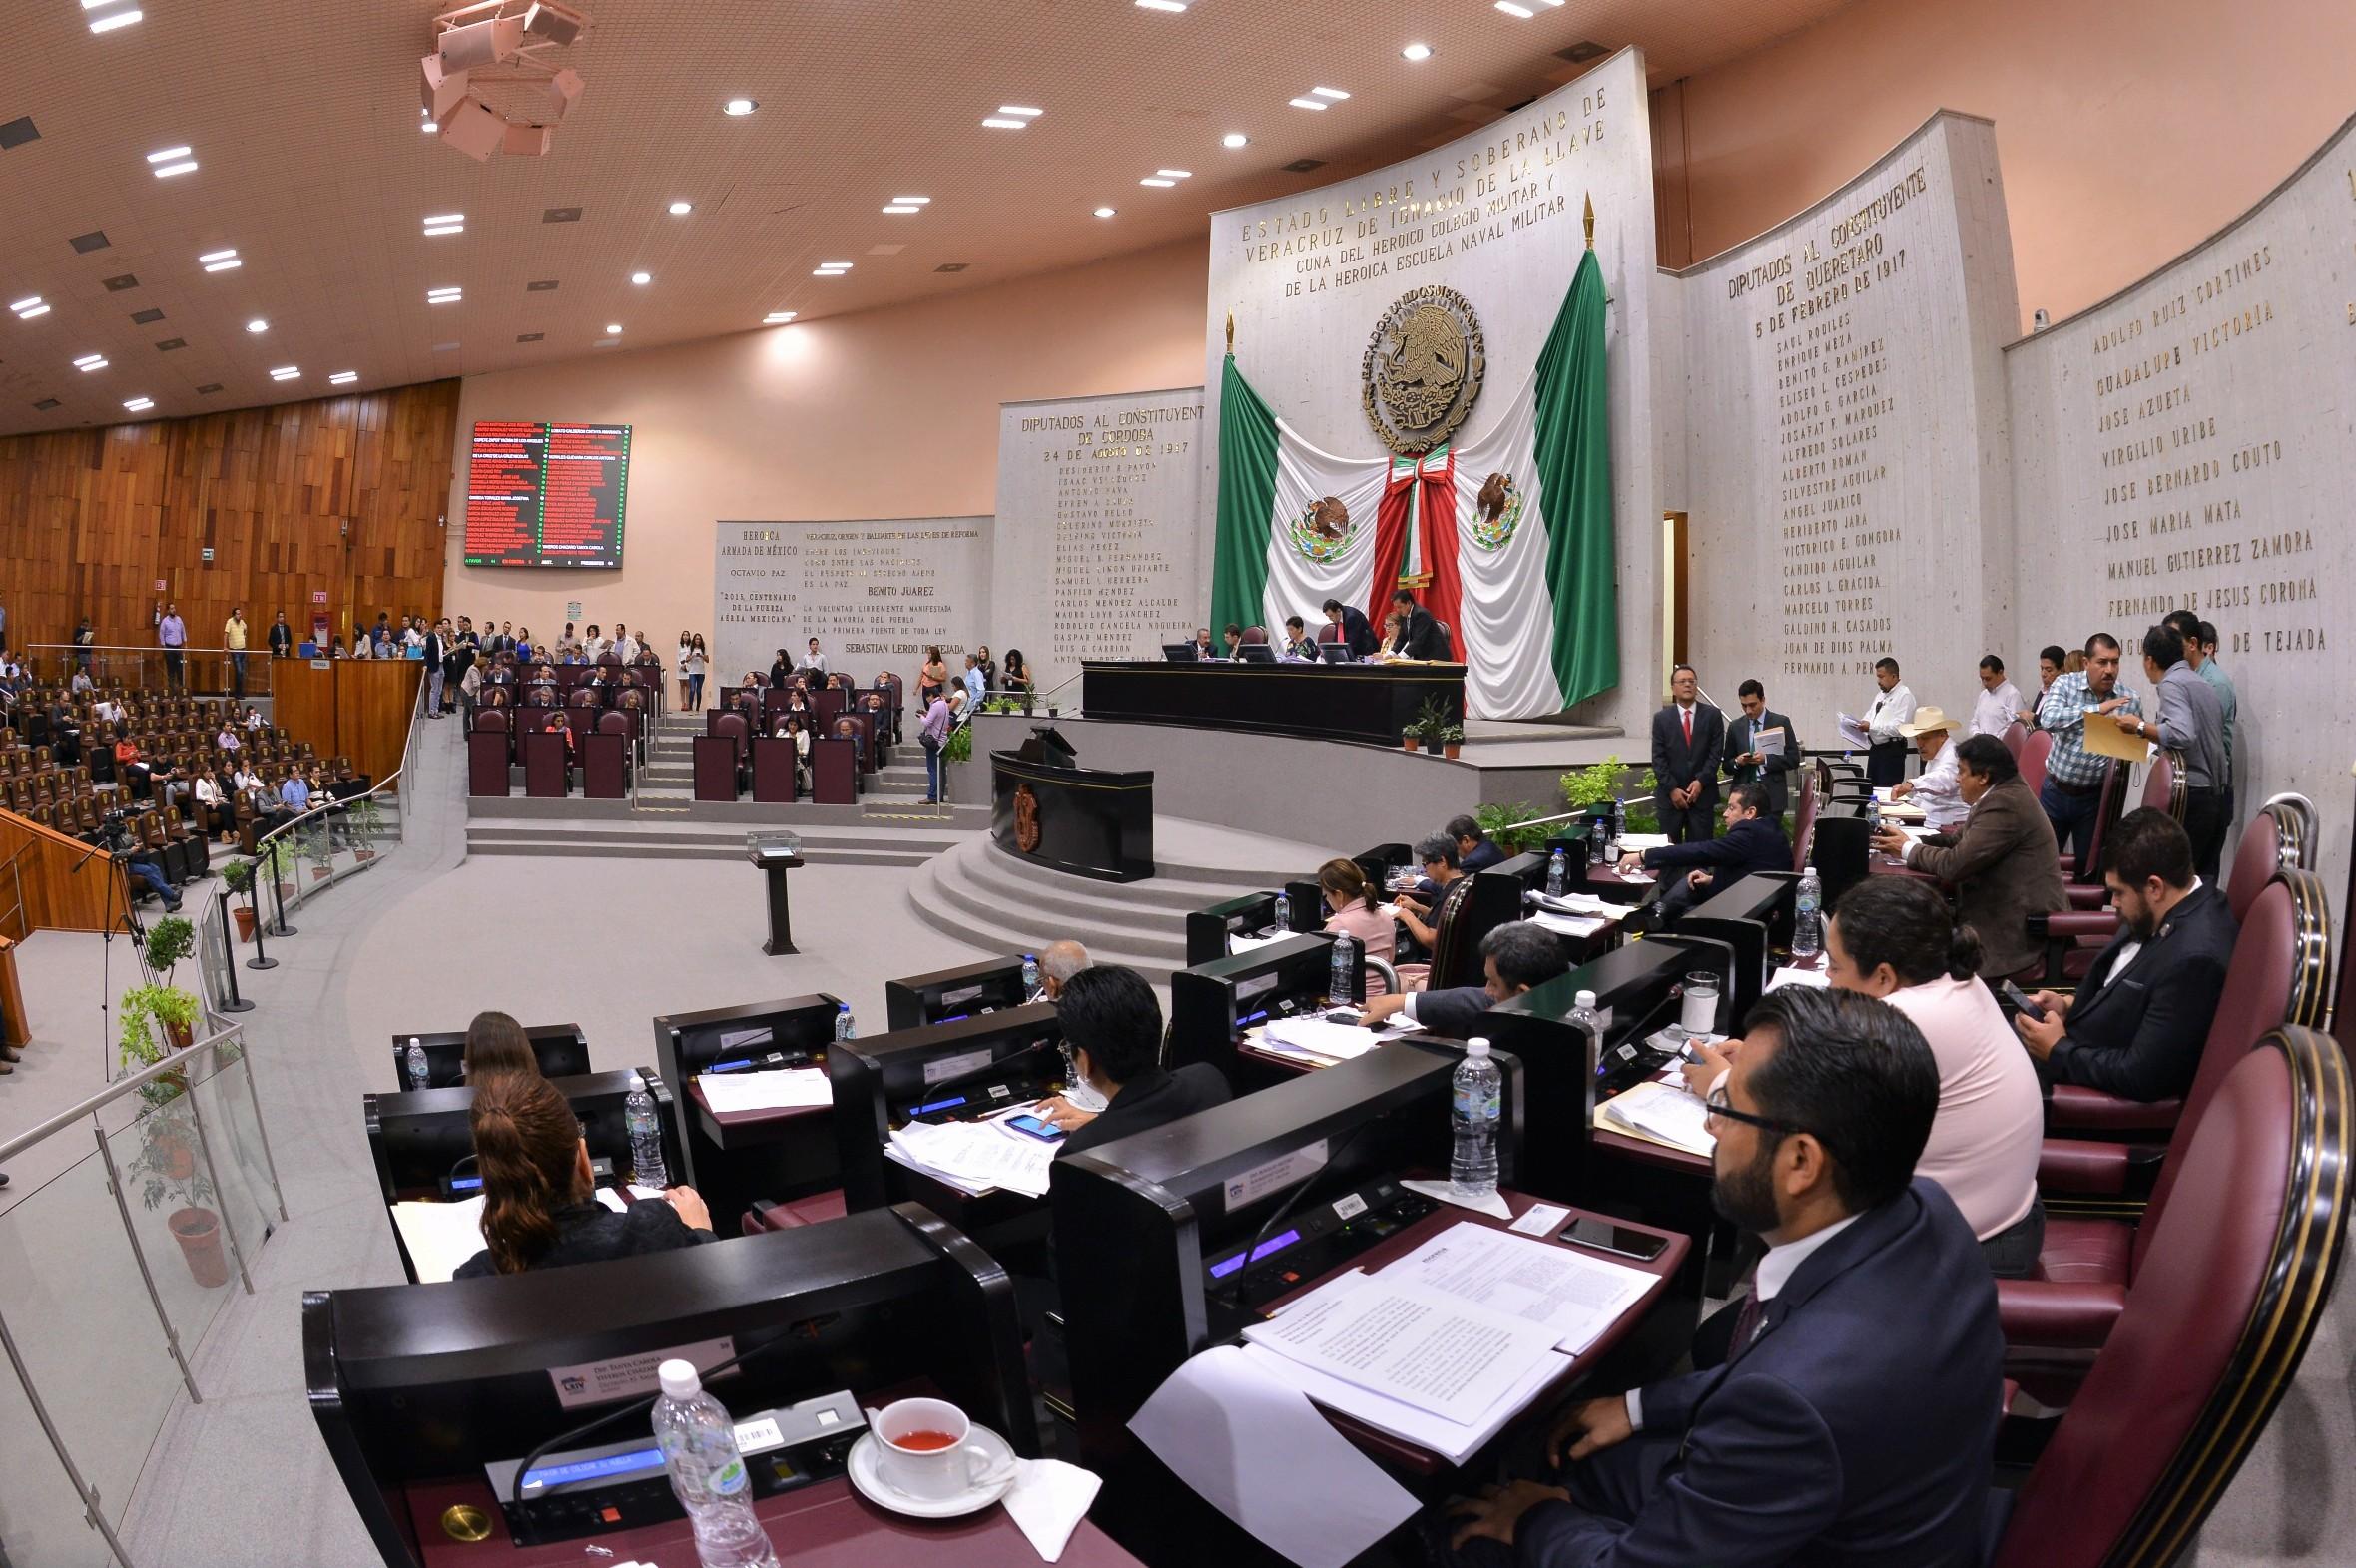 Congreso avala la creación de Comités de Contraloría Social